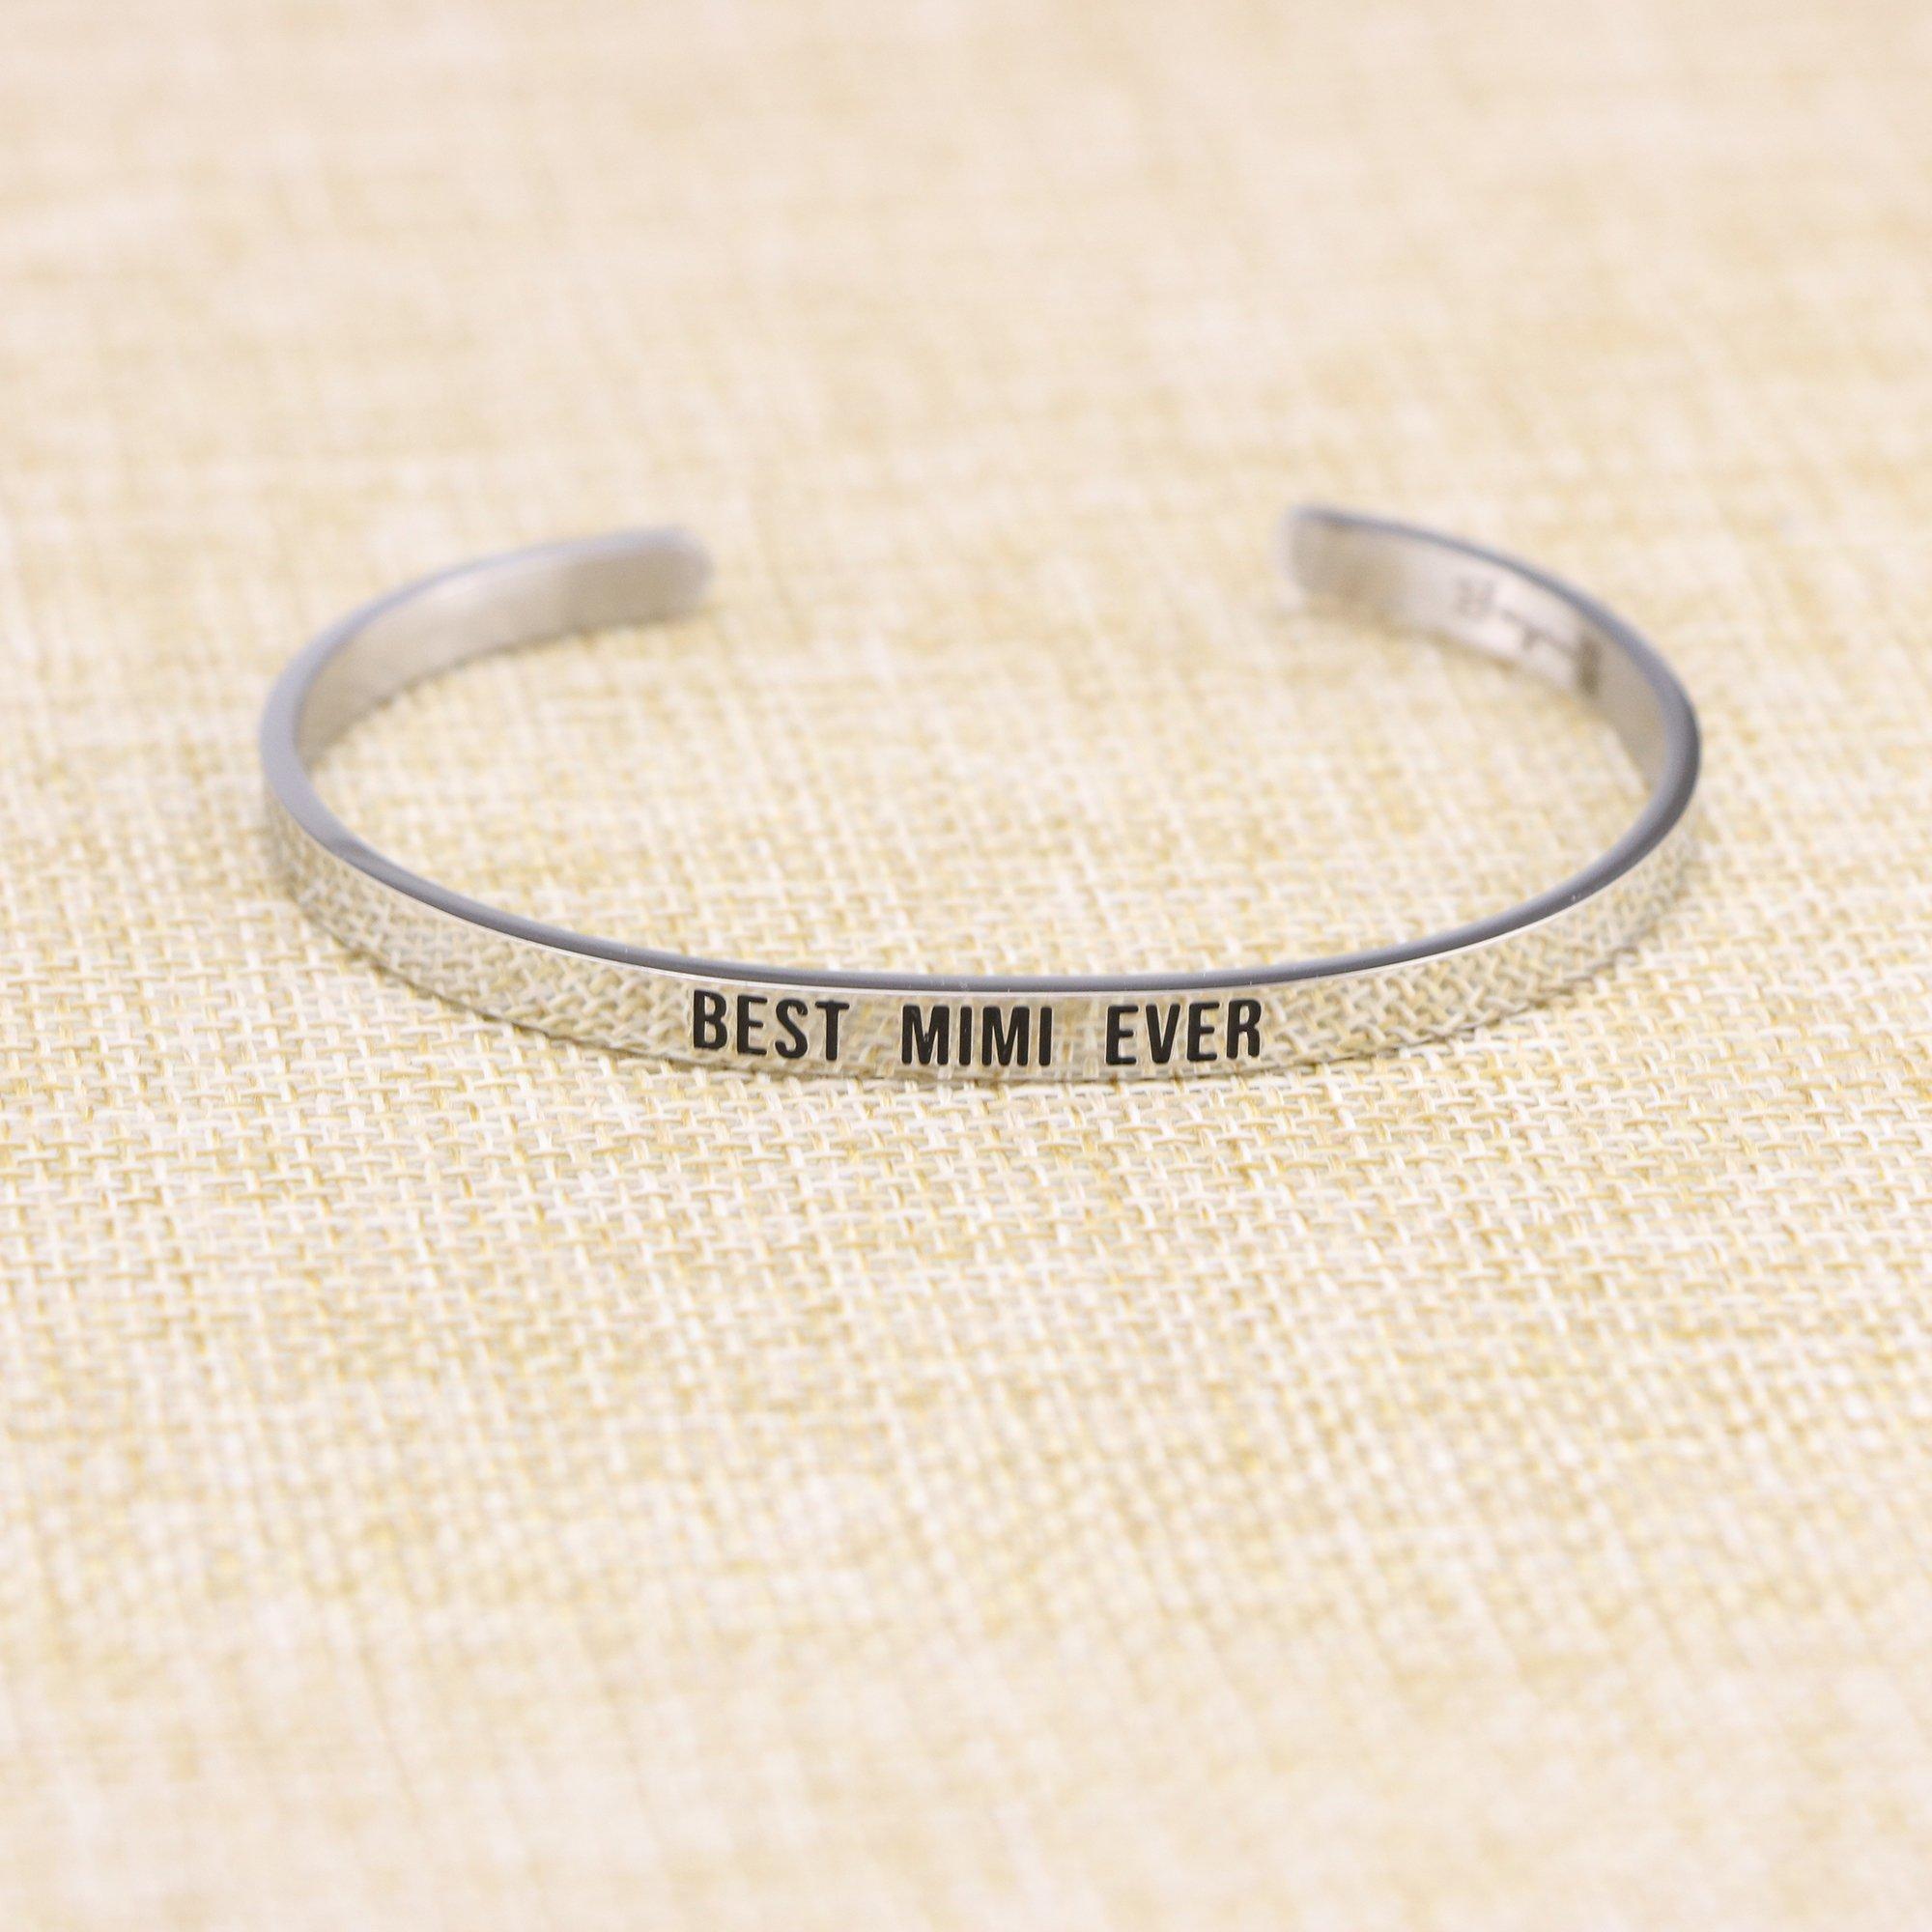 Joycuff Best Mimi Ever Bracelet Jewelry Gifts for Grandma Mantra Cuff Bracelets Bangle by Joycuff (Image #4)